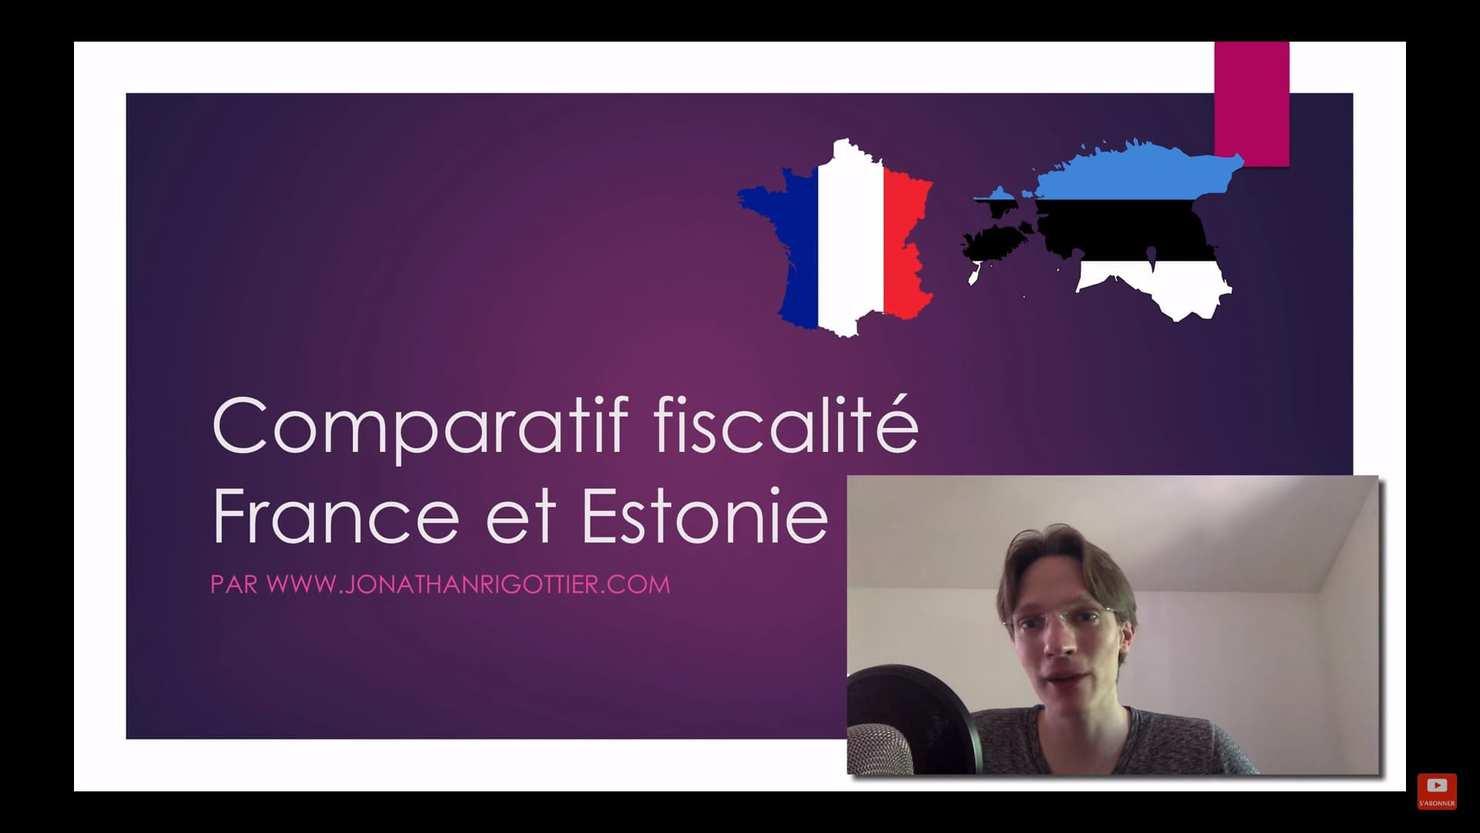 Site de rencontres gratuit Estonie